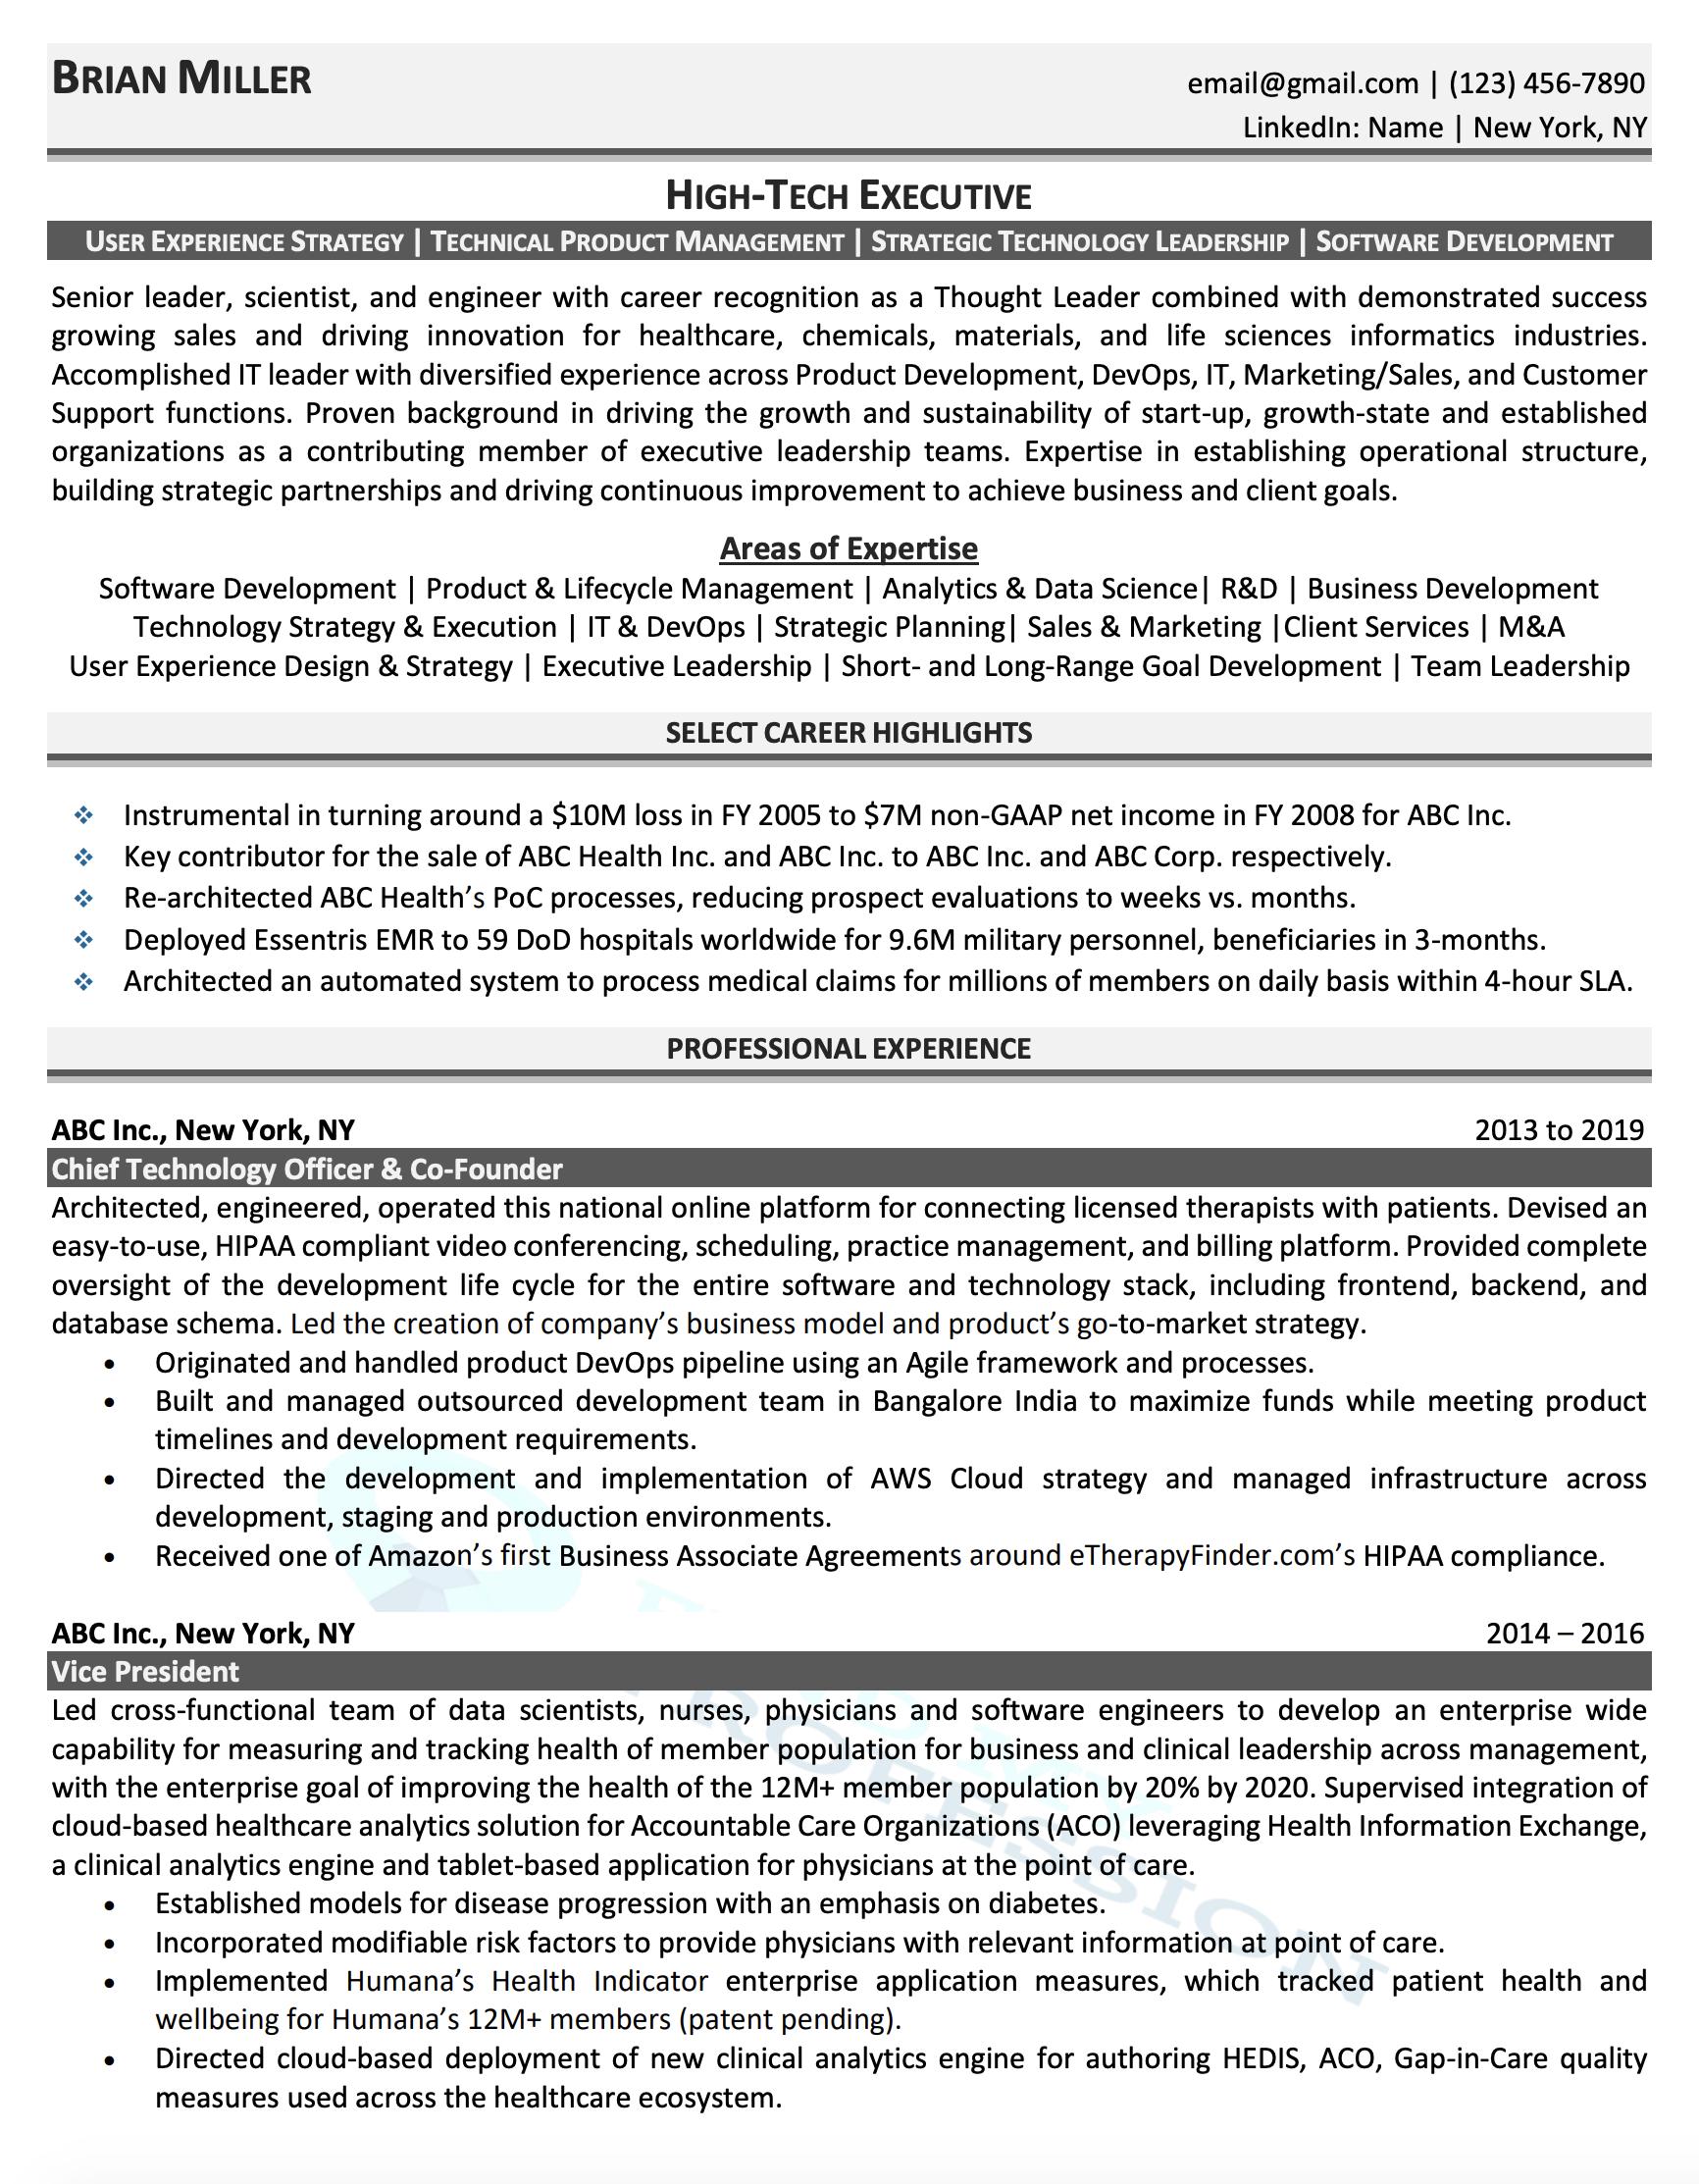 8 Job interview ideas | job interview, job, interview